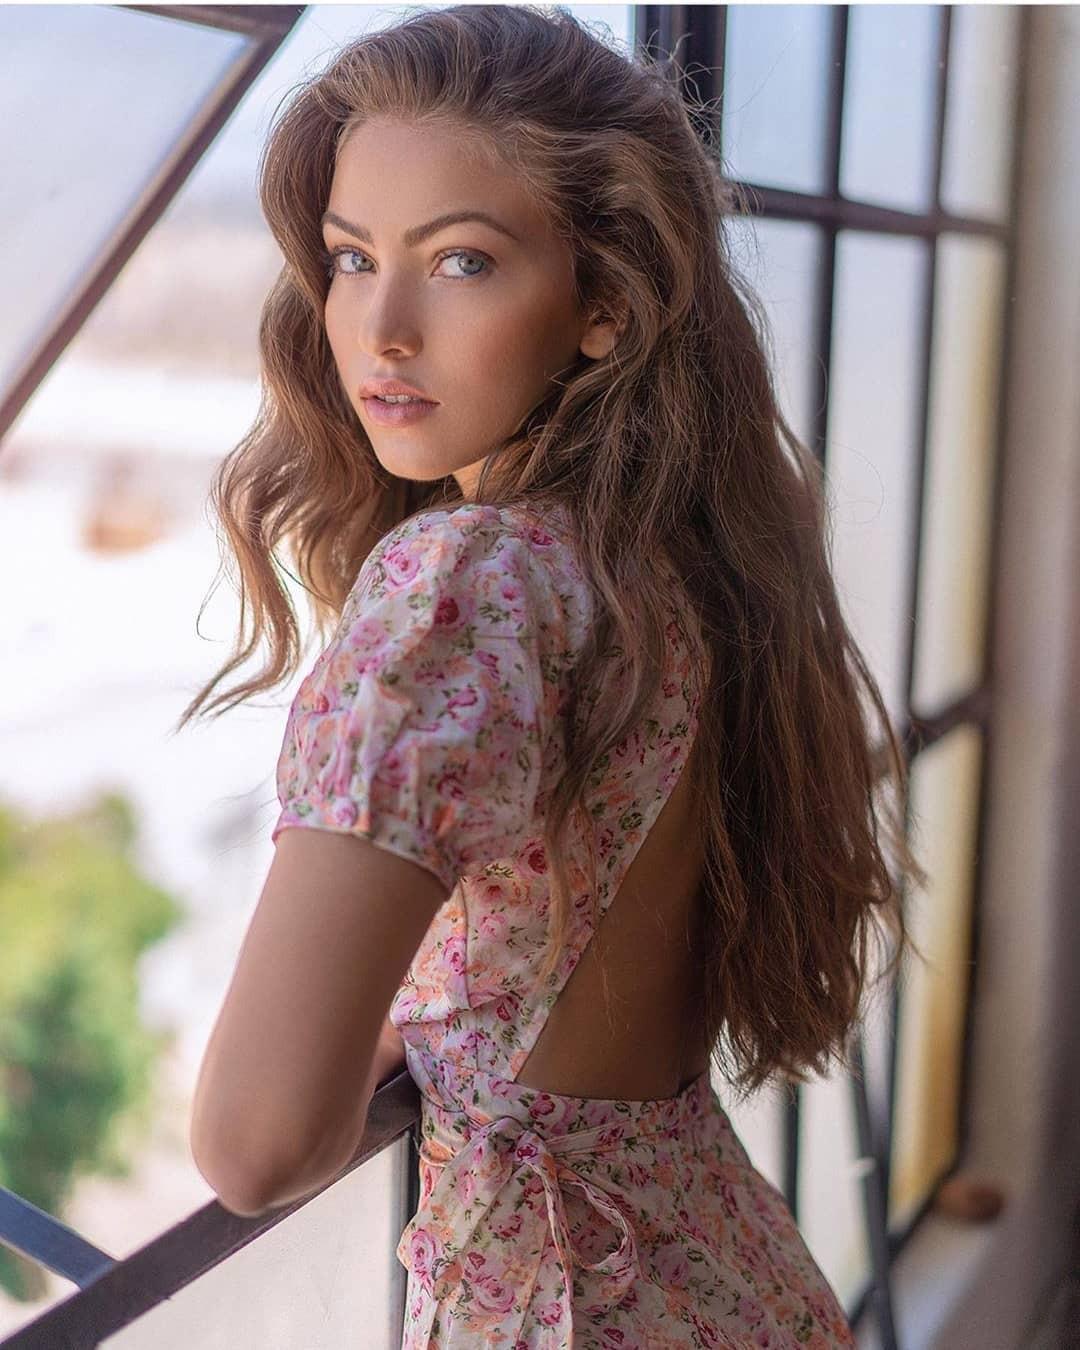 Teenager Model